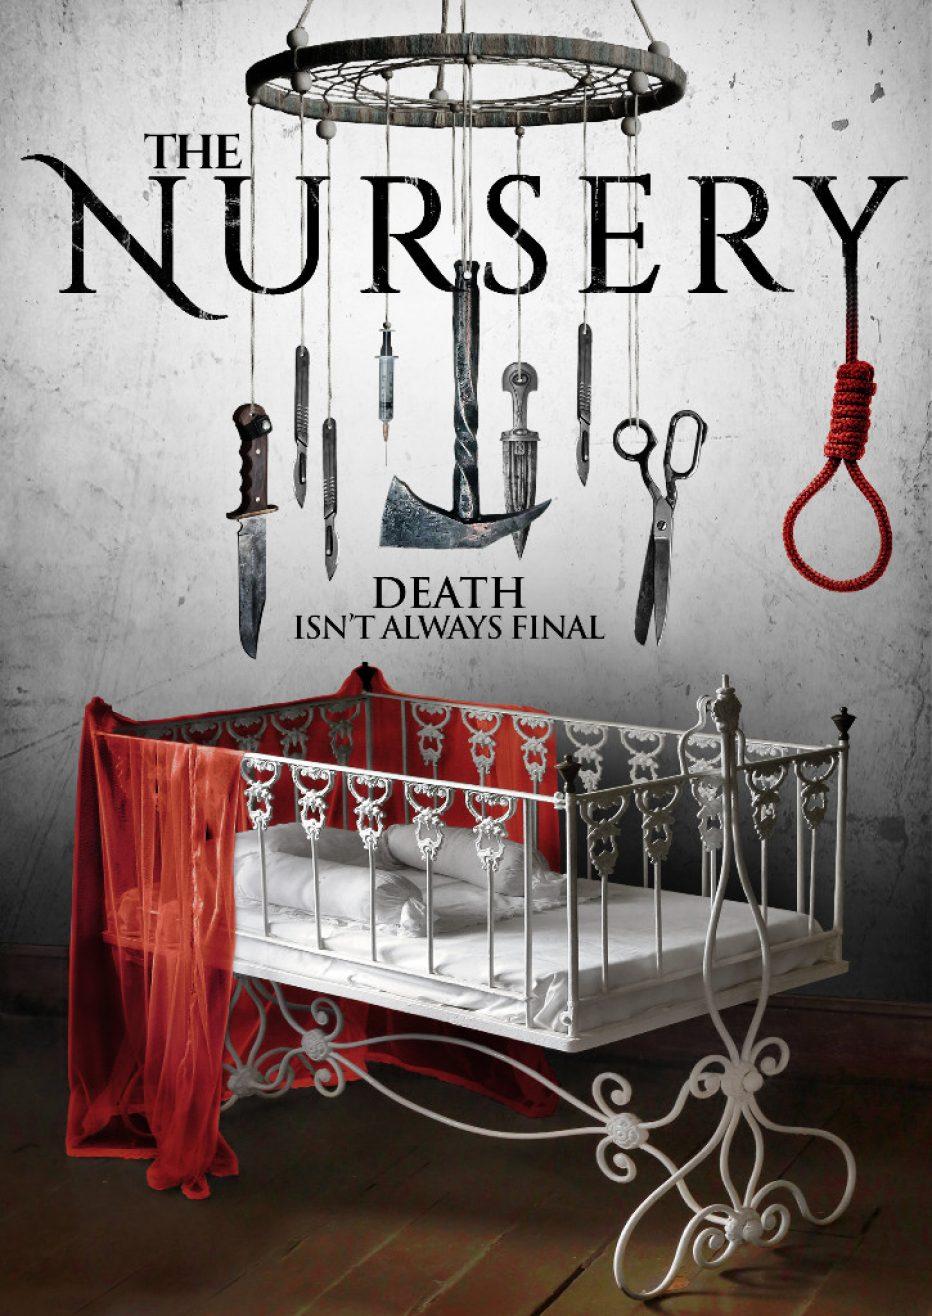 Supernatural horror THE NURSERY premieres on VOD this June!